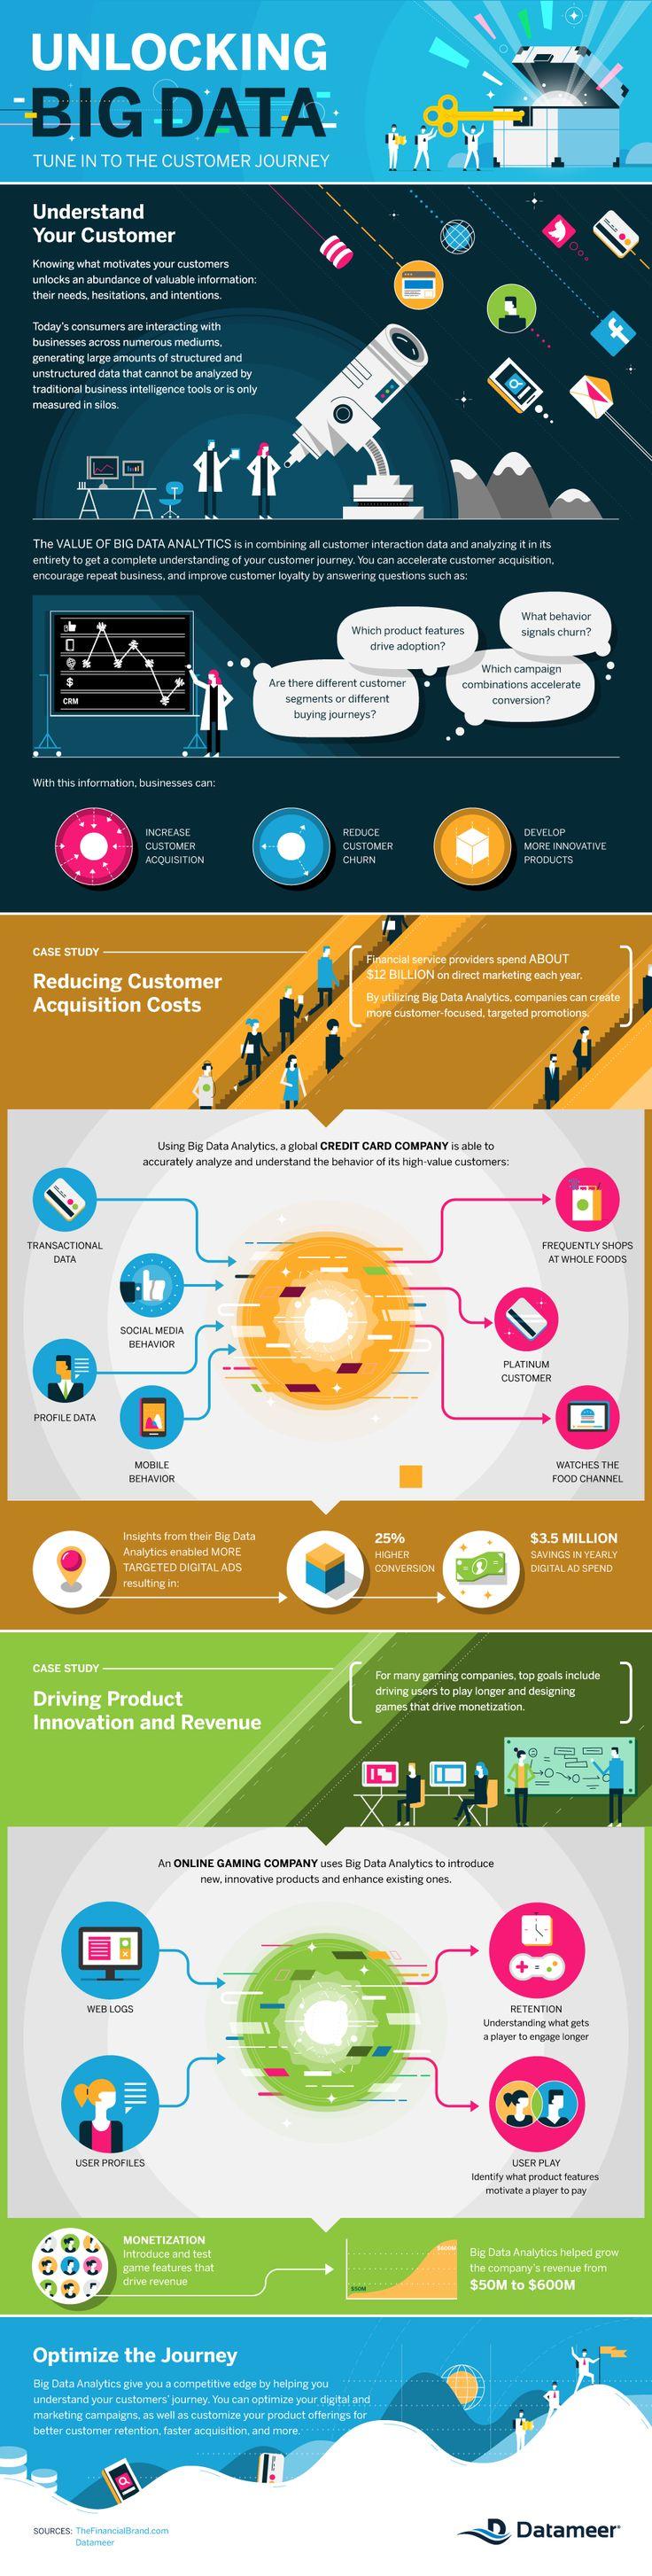 Unlocking Big Data Tune in to the Customer Journey #infographic ~ Visualistan